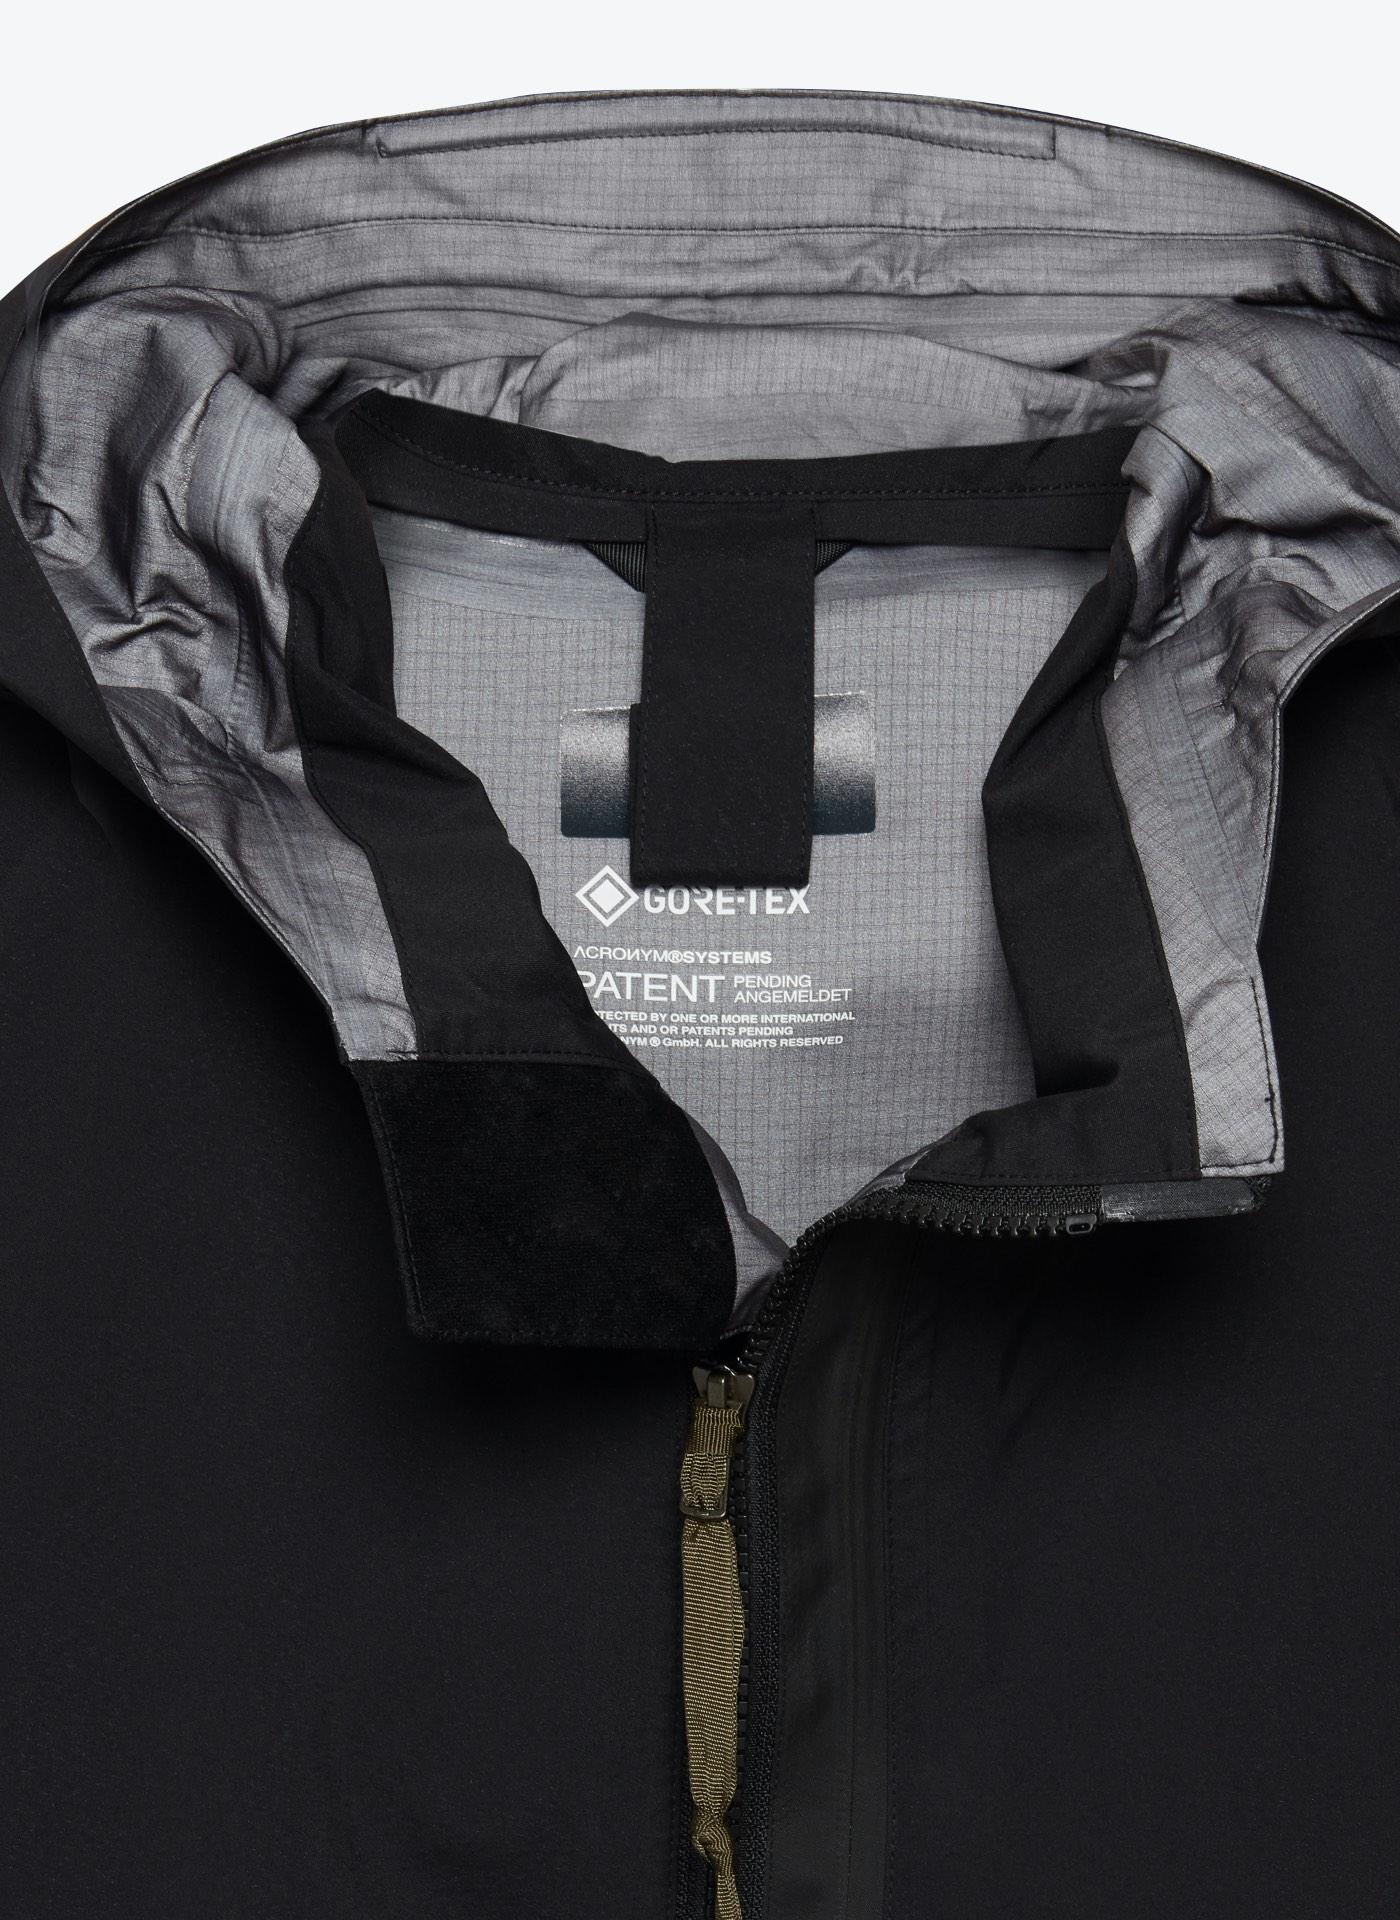 black and grey coat close up shot